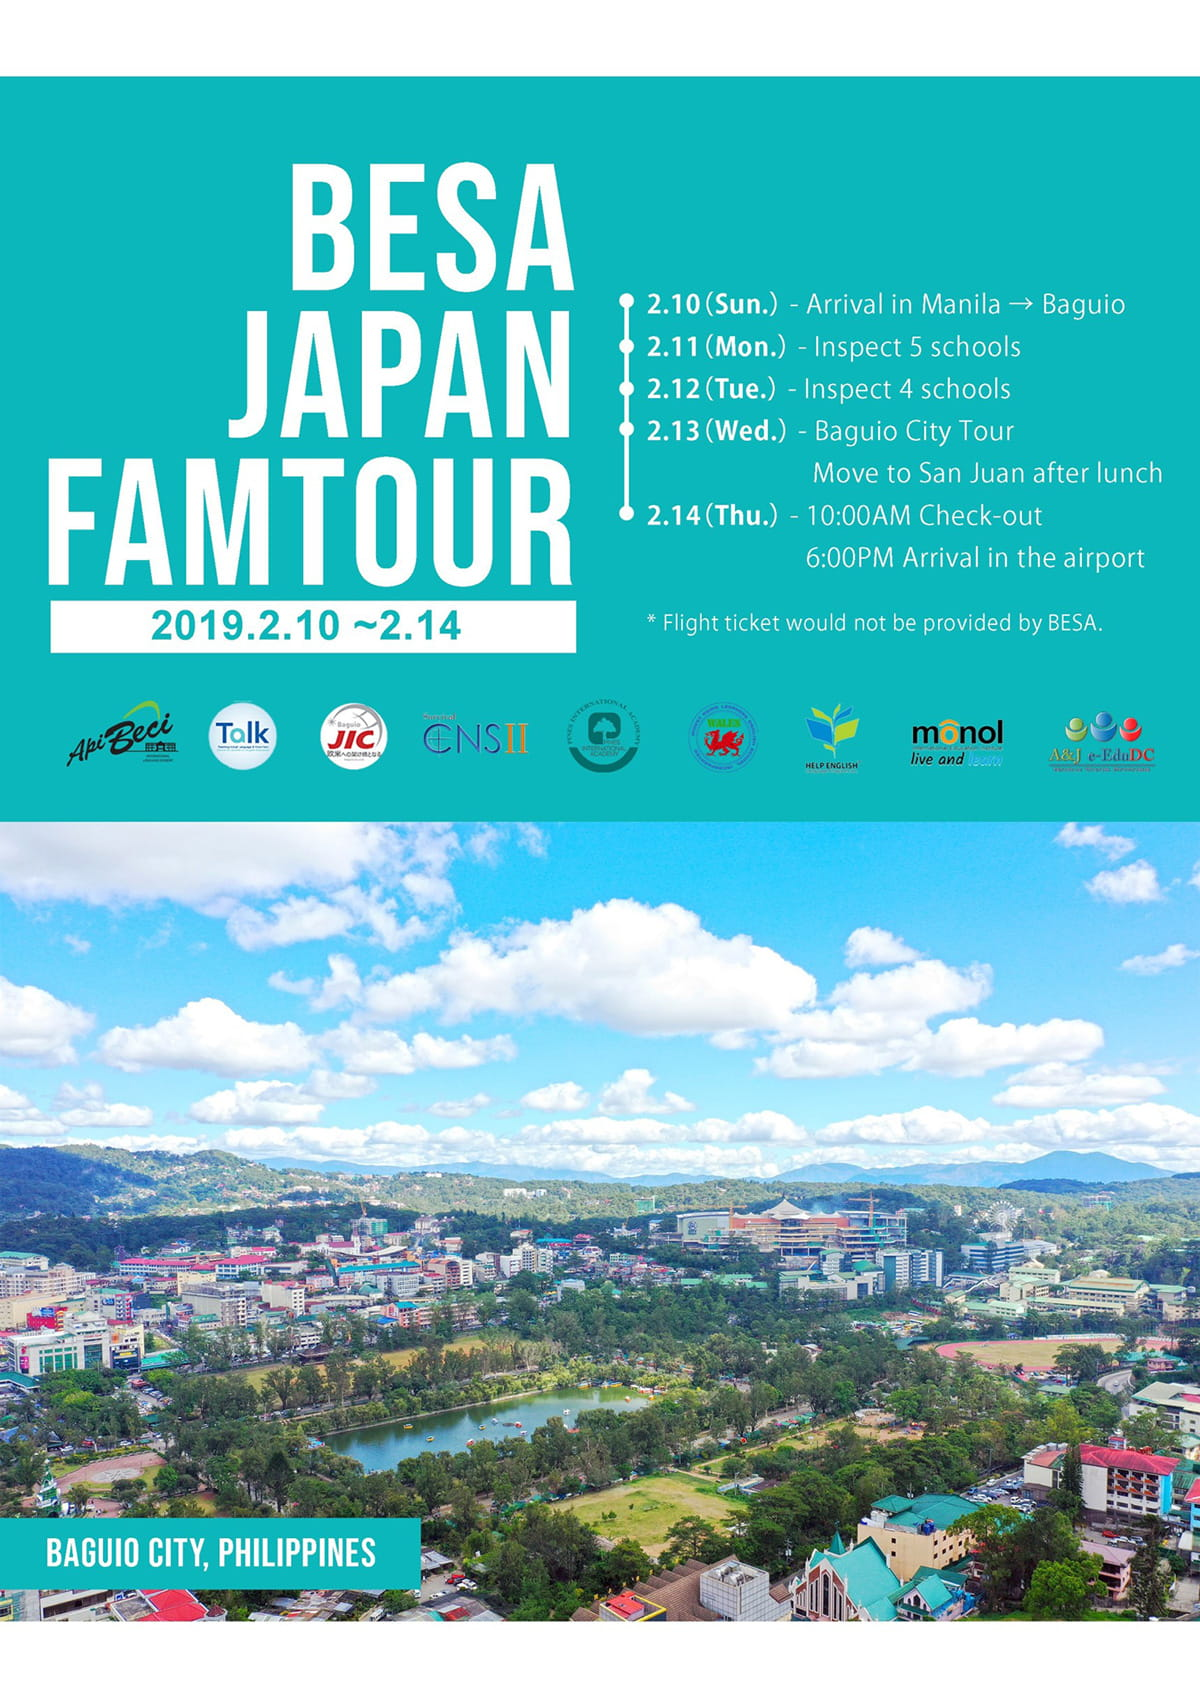 BESA JAPAN FAMTOUR 2019